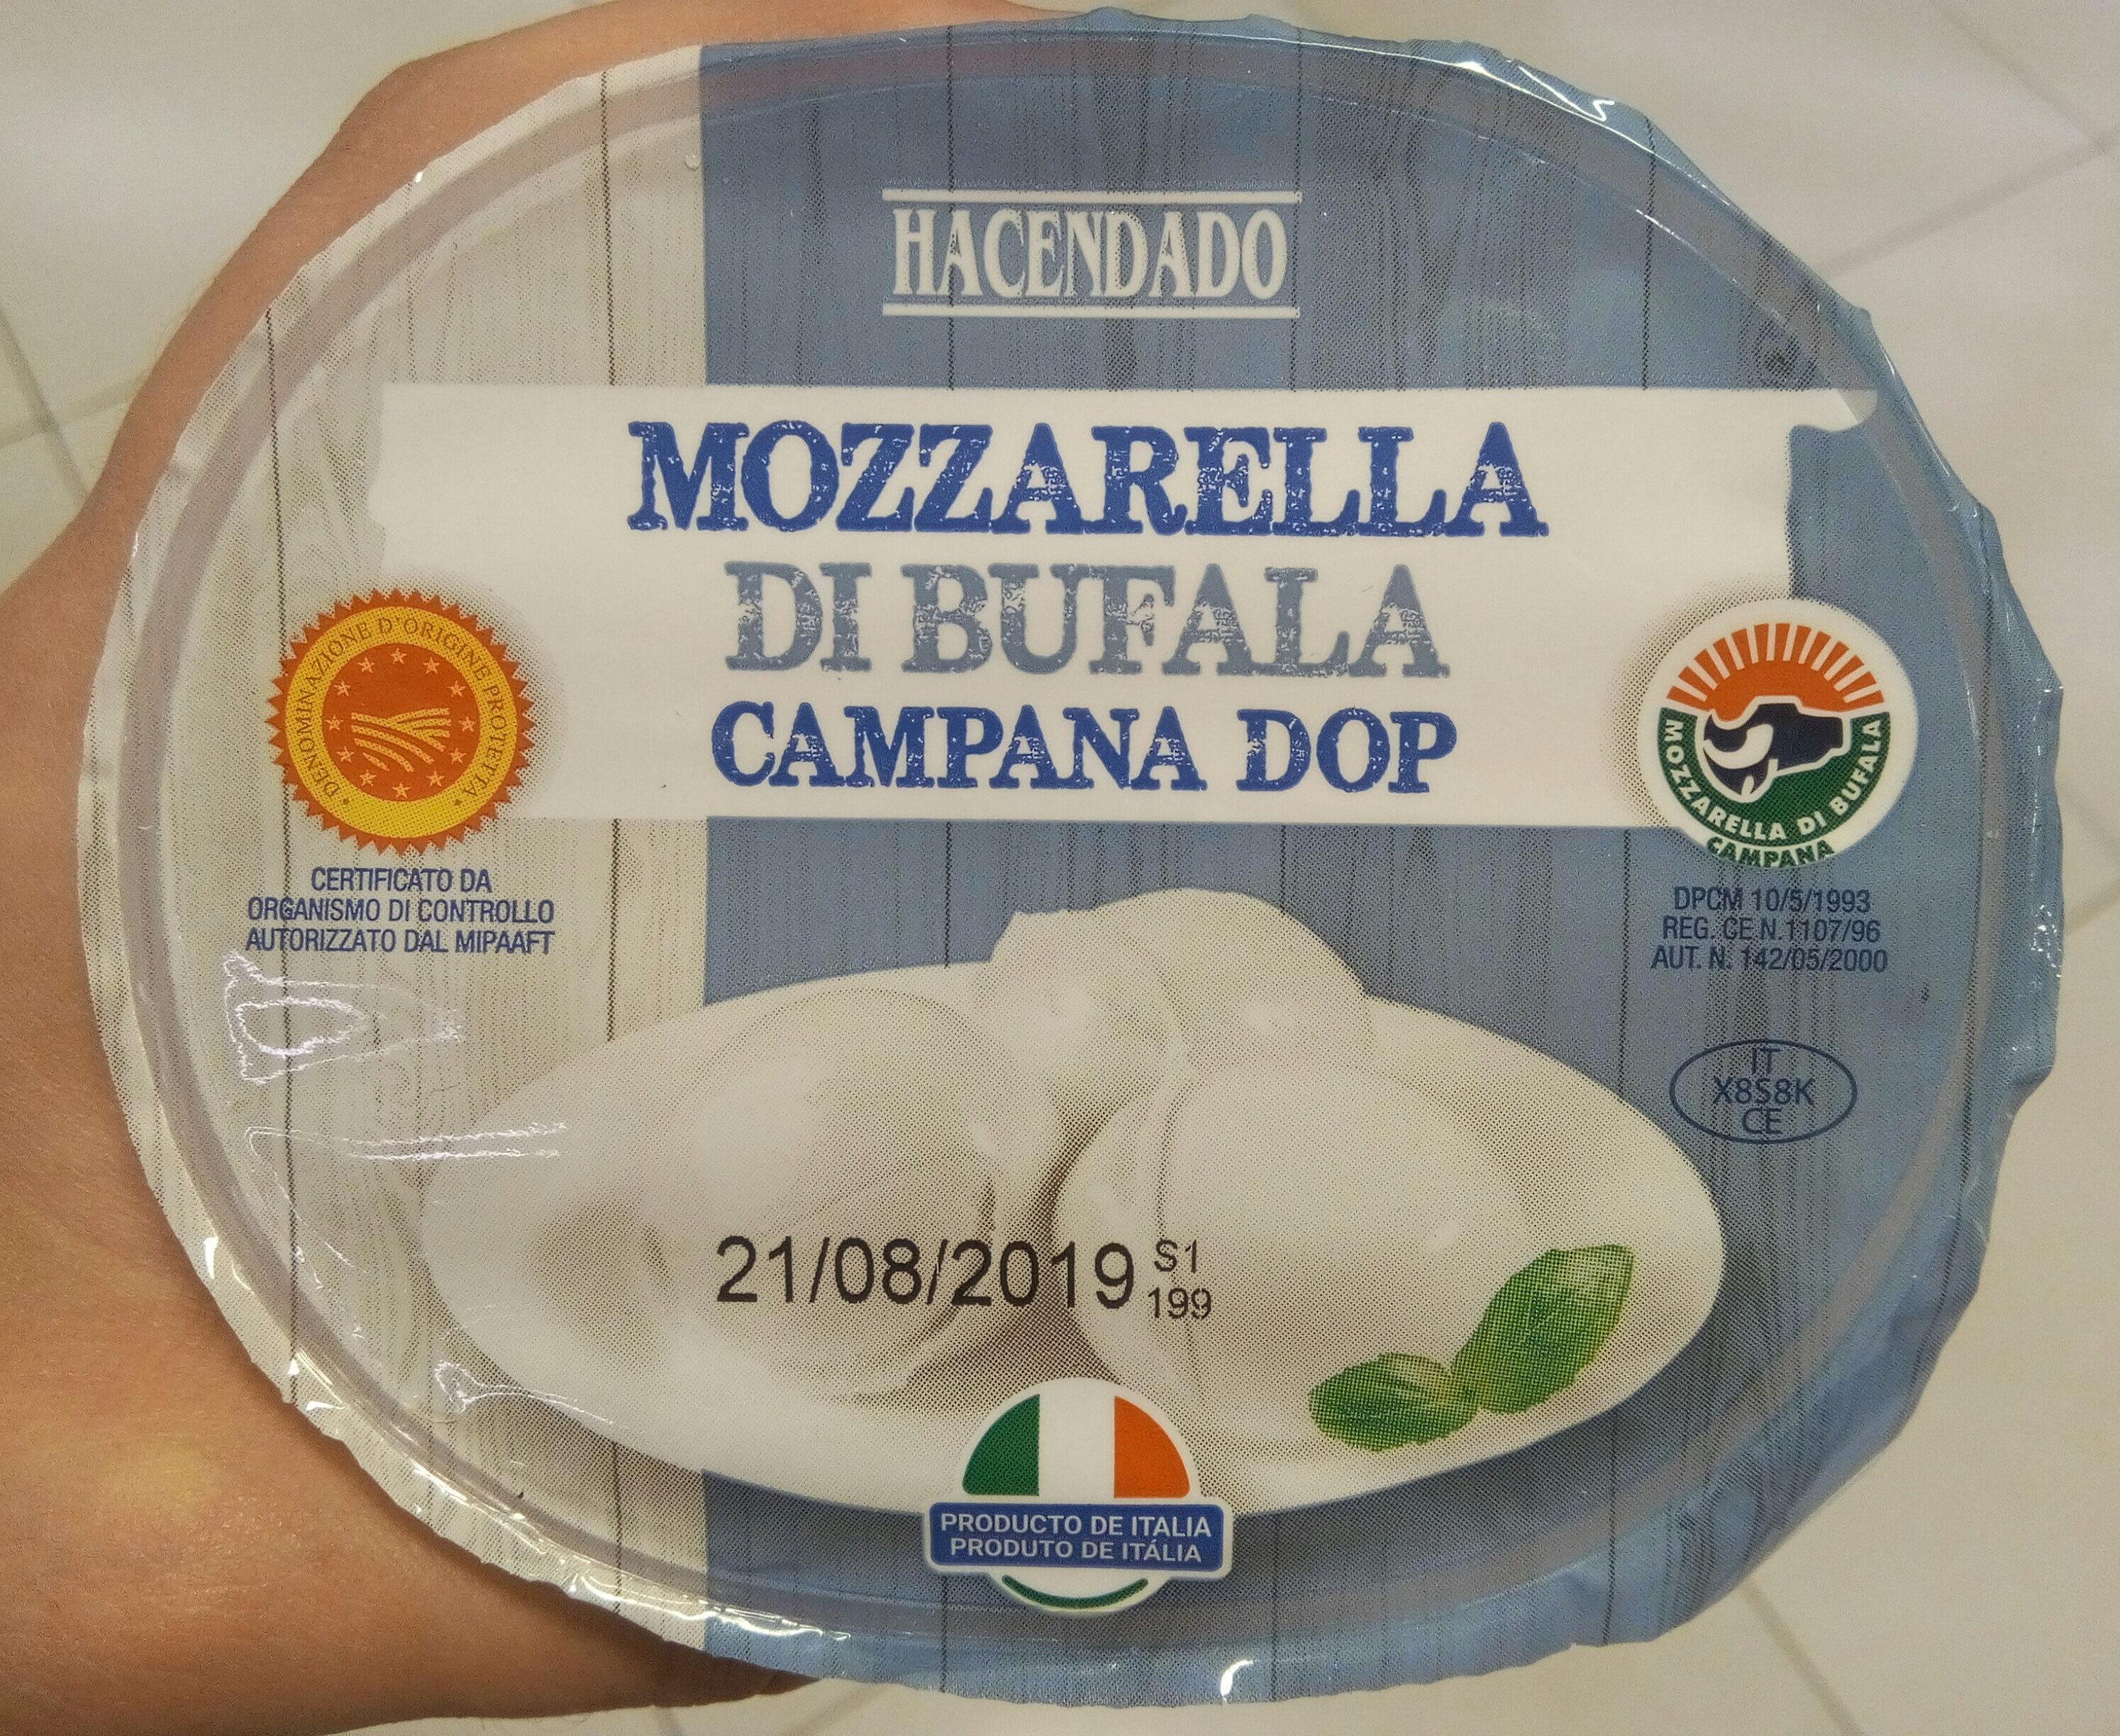 Mozzarella di bufala campana - Product - es